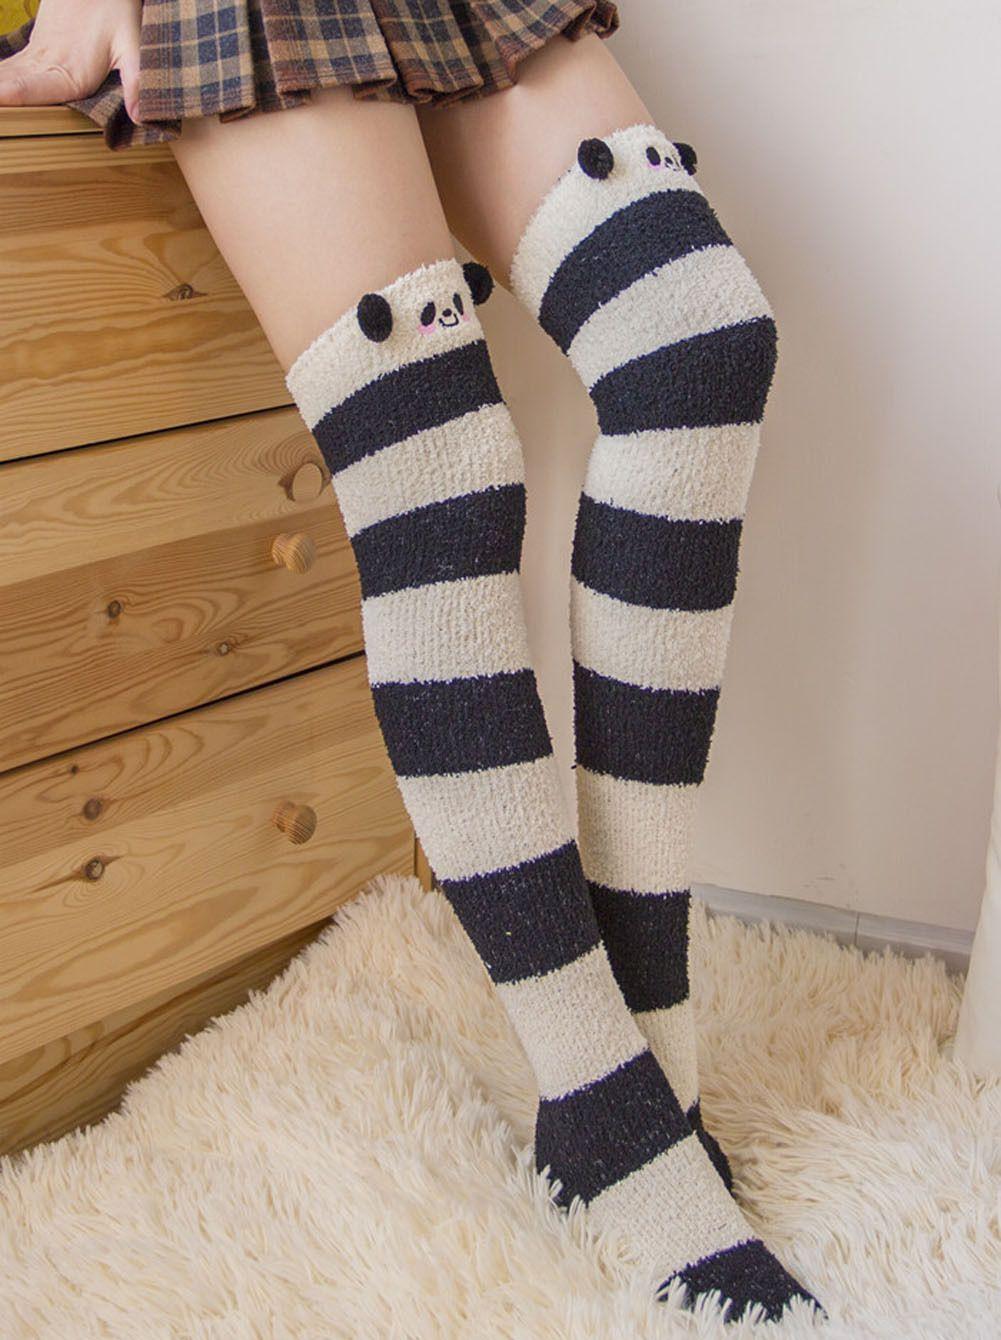 11.99 - Cute Animal Coral Fleece Knee  Thigh High Striped Socks Stocking  For Women Girls  ebay  Fashion 8deeb40edadc